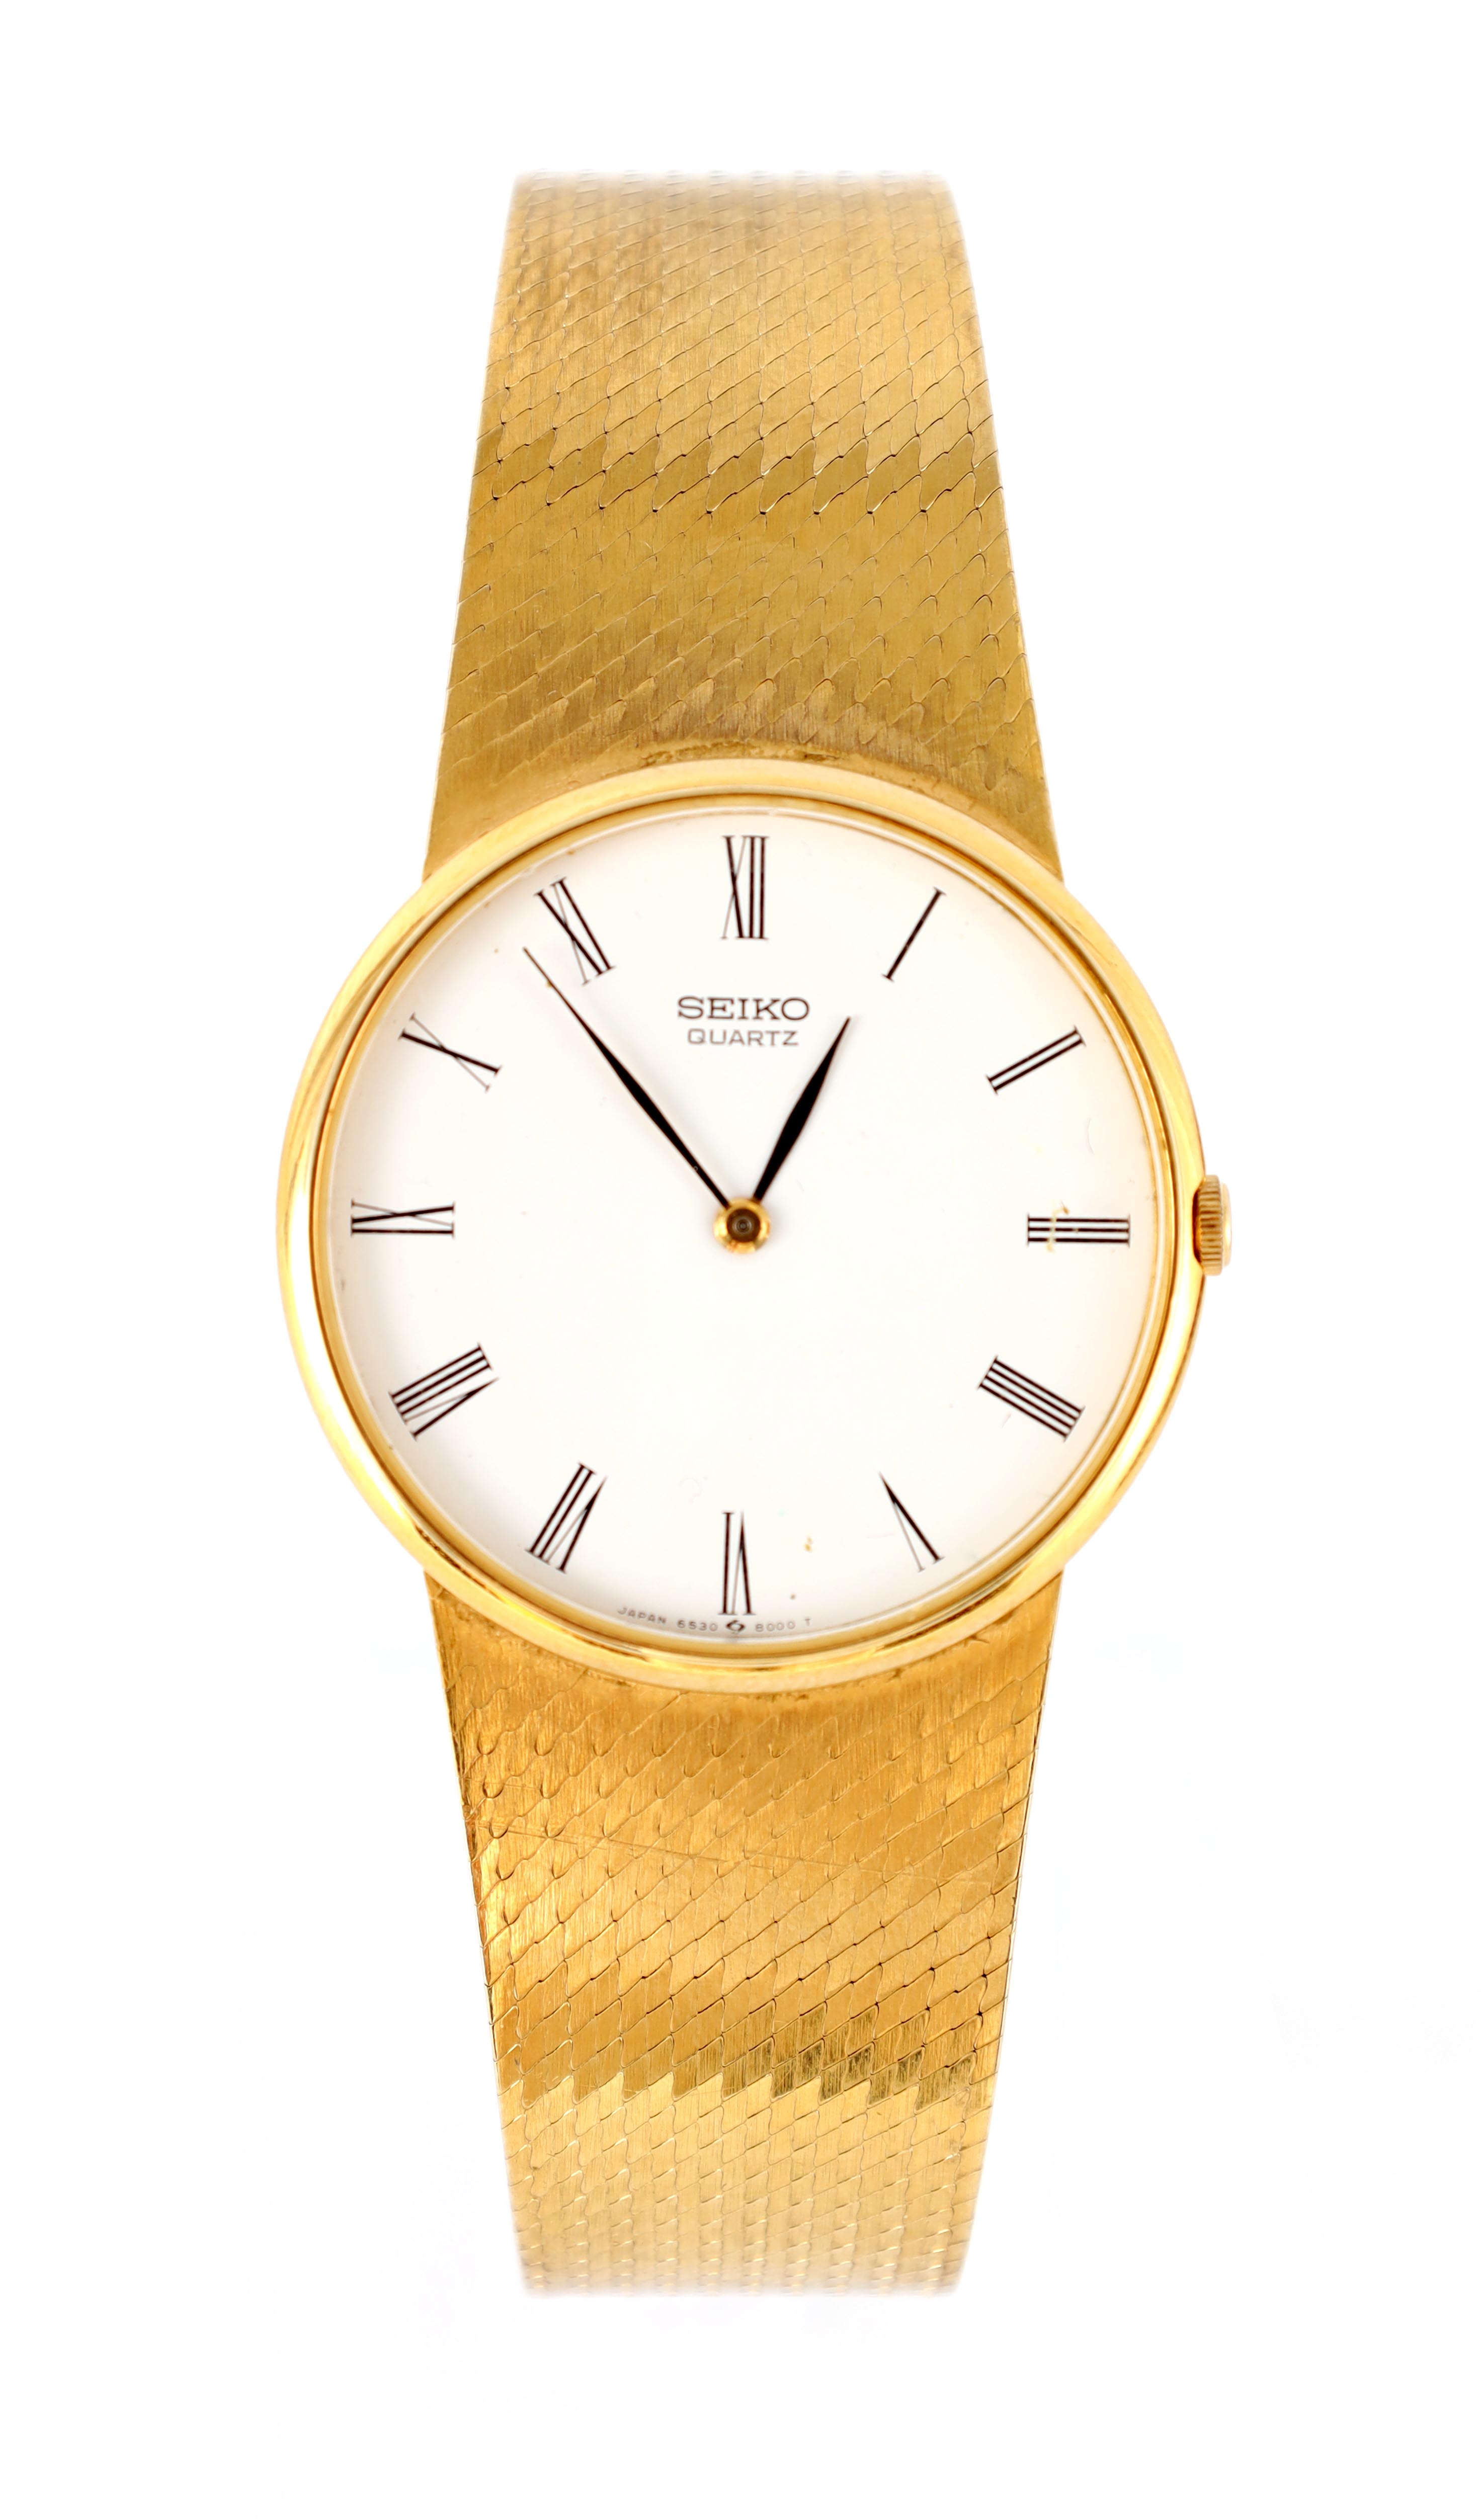 A GENTLEMAN'S 9CT GOLD SEIKO WRISTWATCH on original 9ct gold bracelet The white enamel dial with